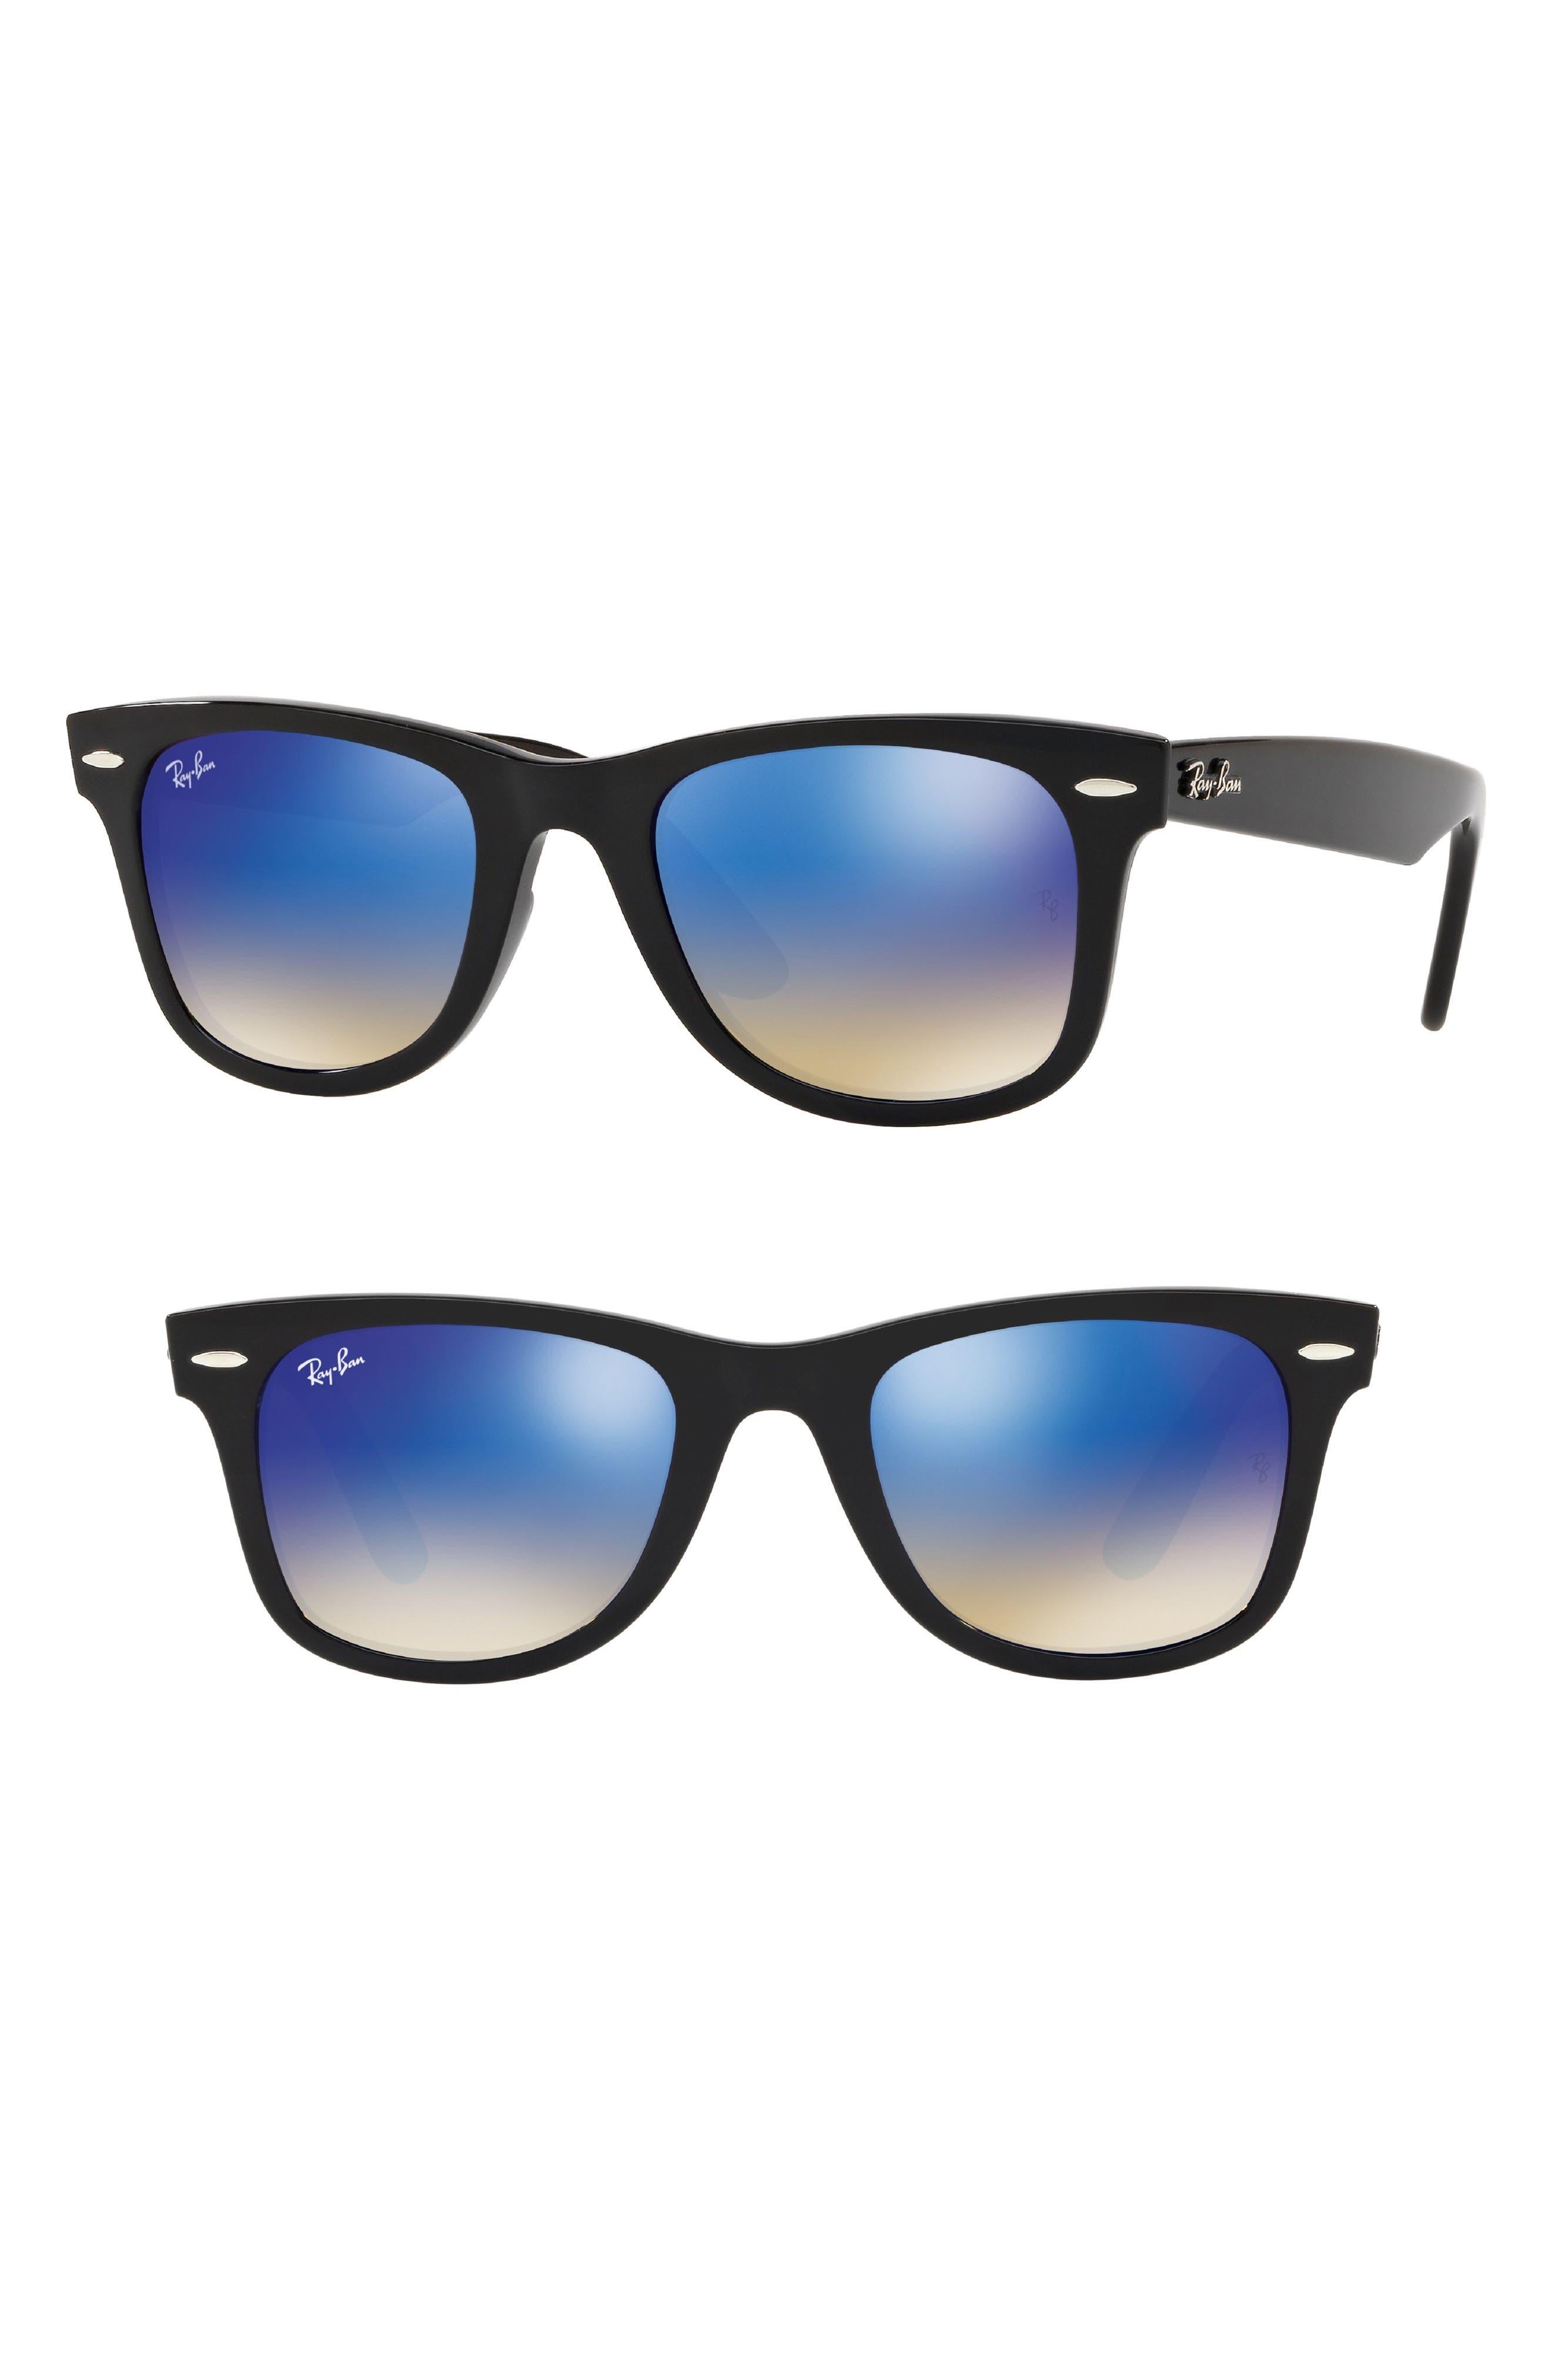 Wayfarer 50mm Mirrored Sunglasses,                             Main thumbnail 1, color,                             BLACK